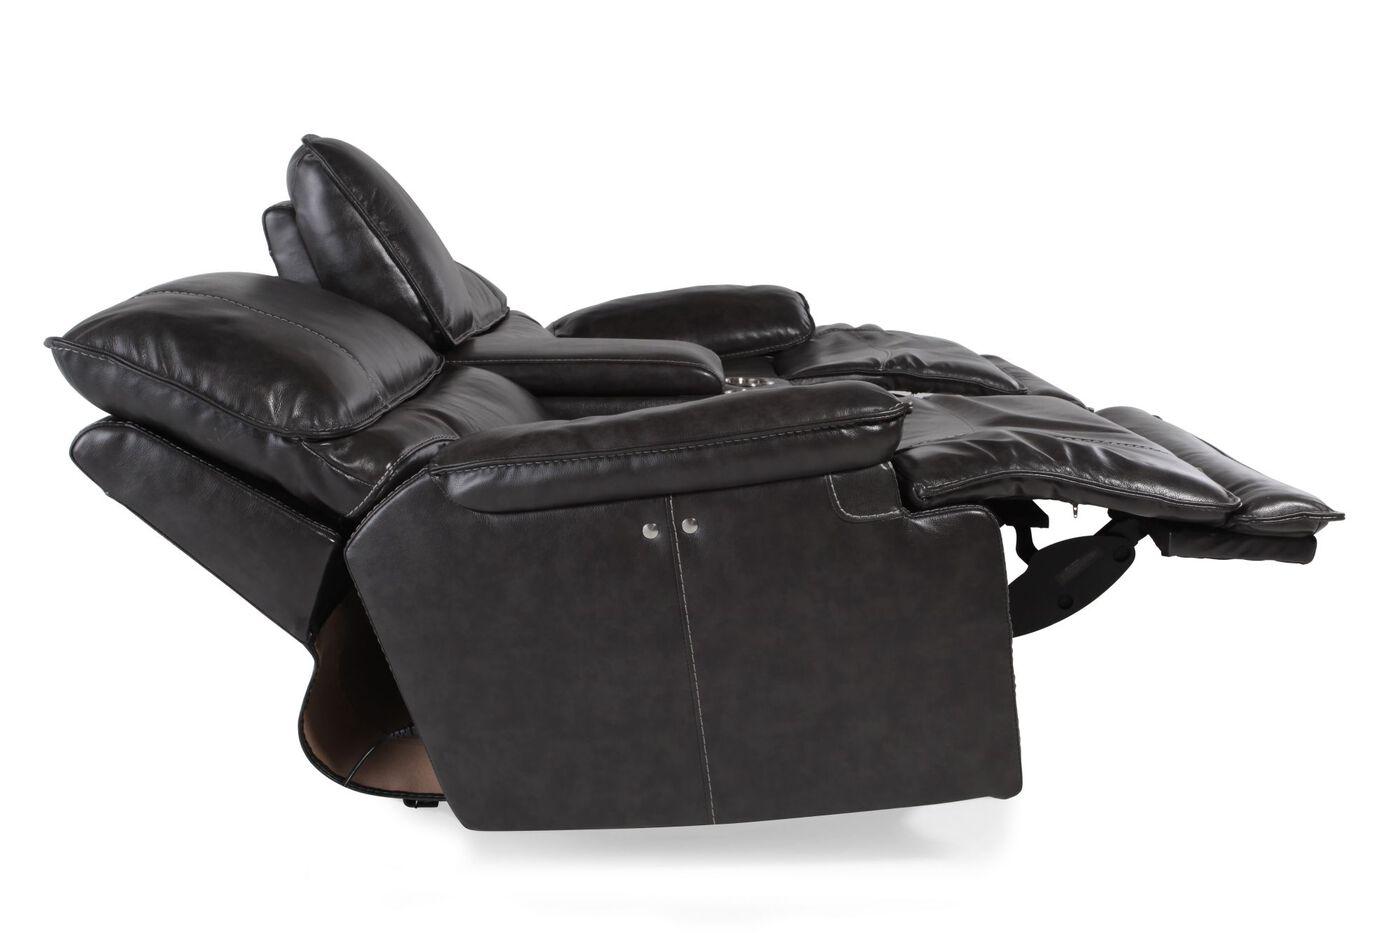 image console loveseats living mor loveseat reclining media coyotera product black room